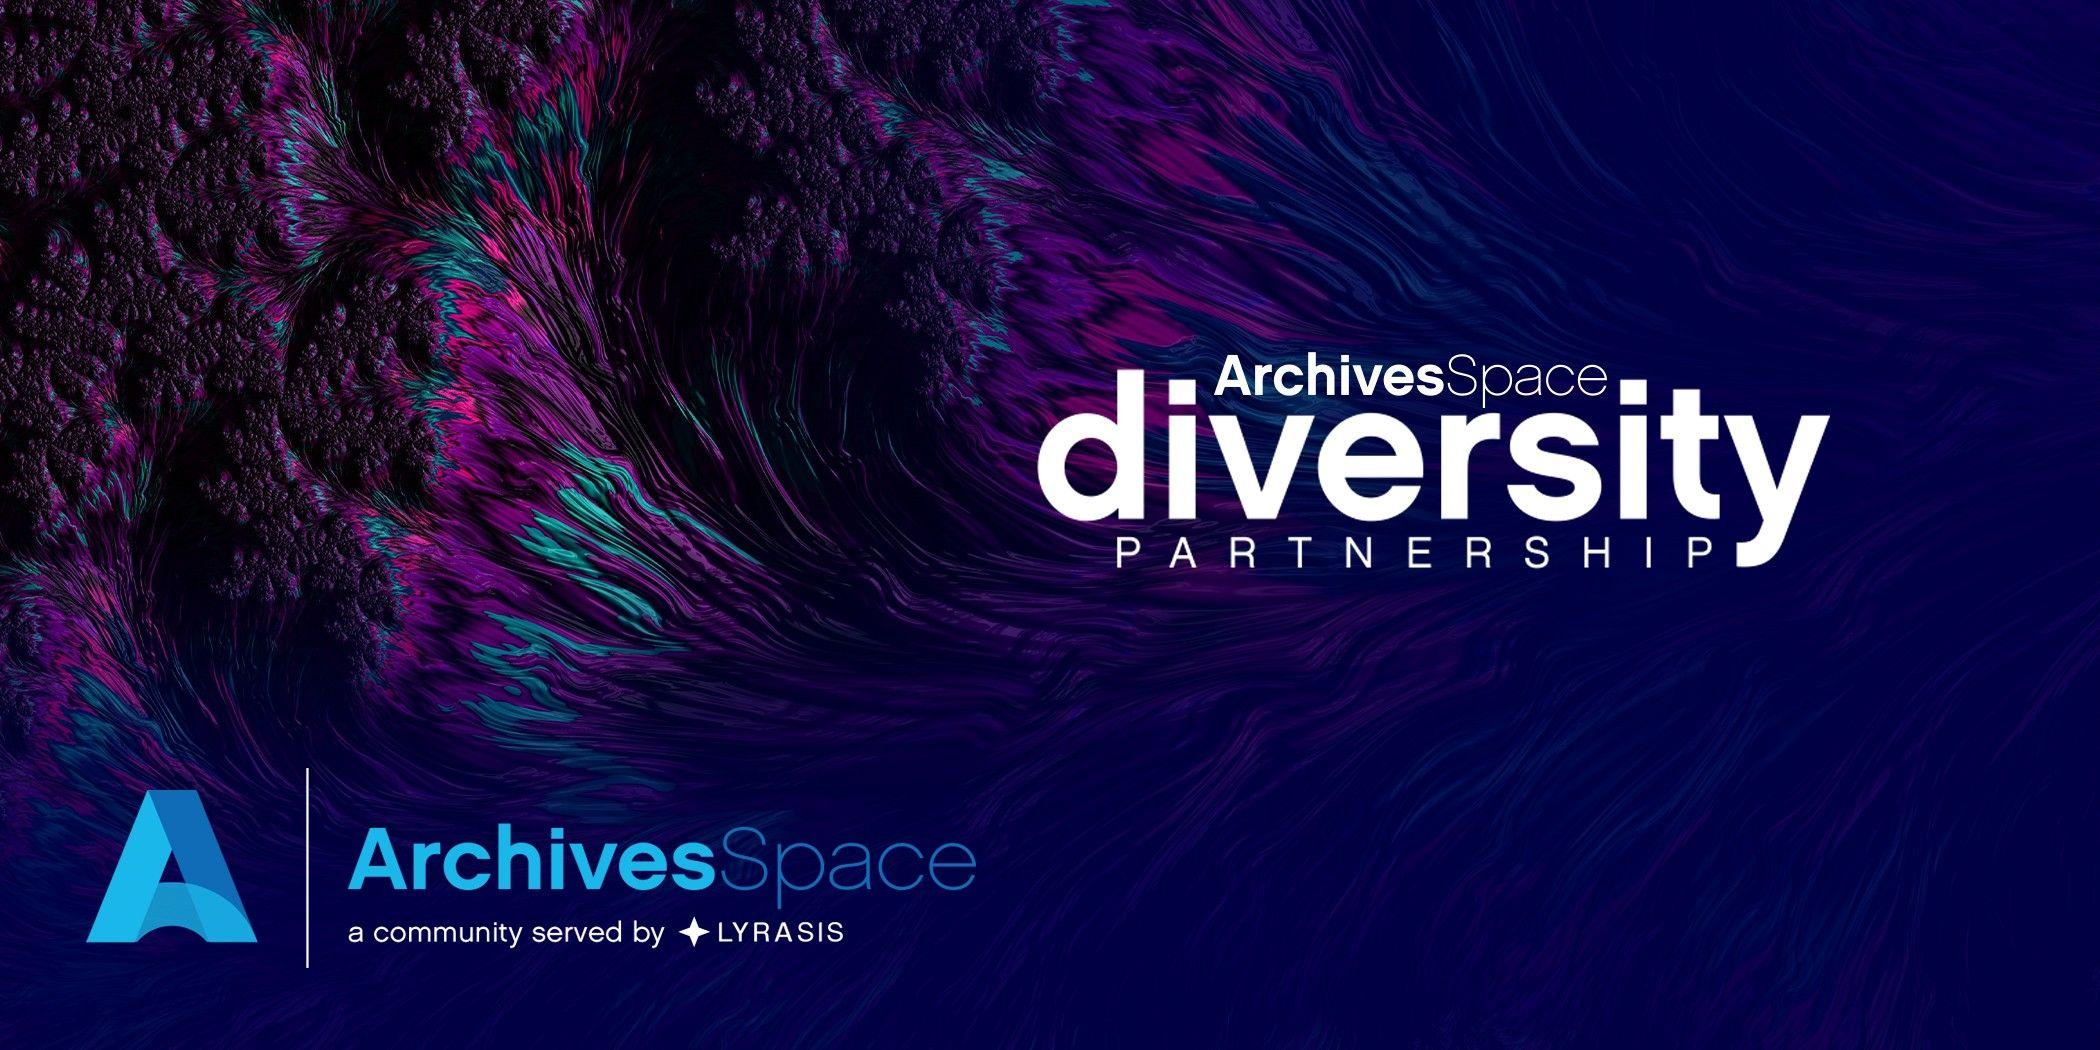 ArchivesSpace Diversity Partnership Graphic